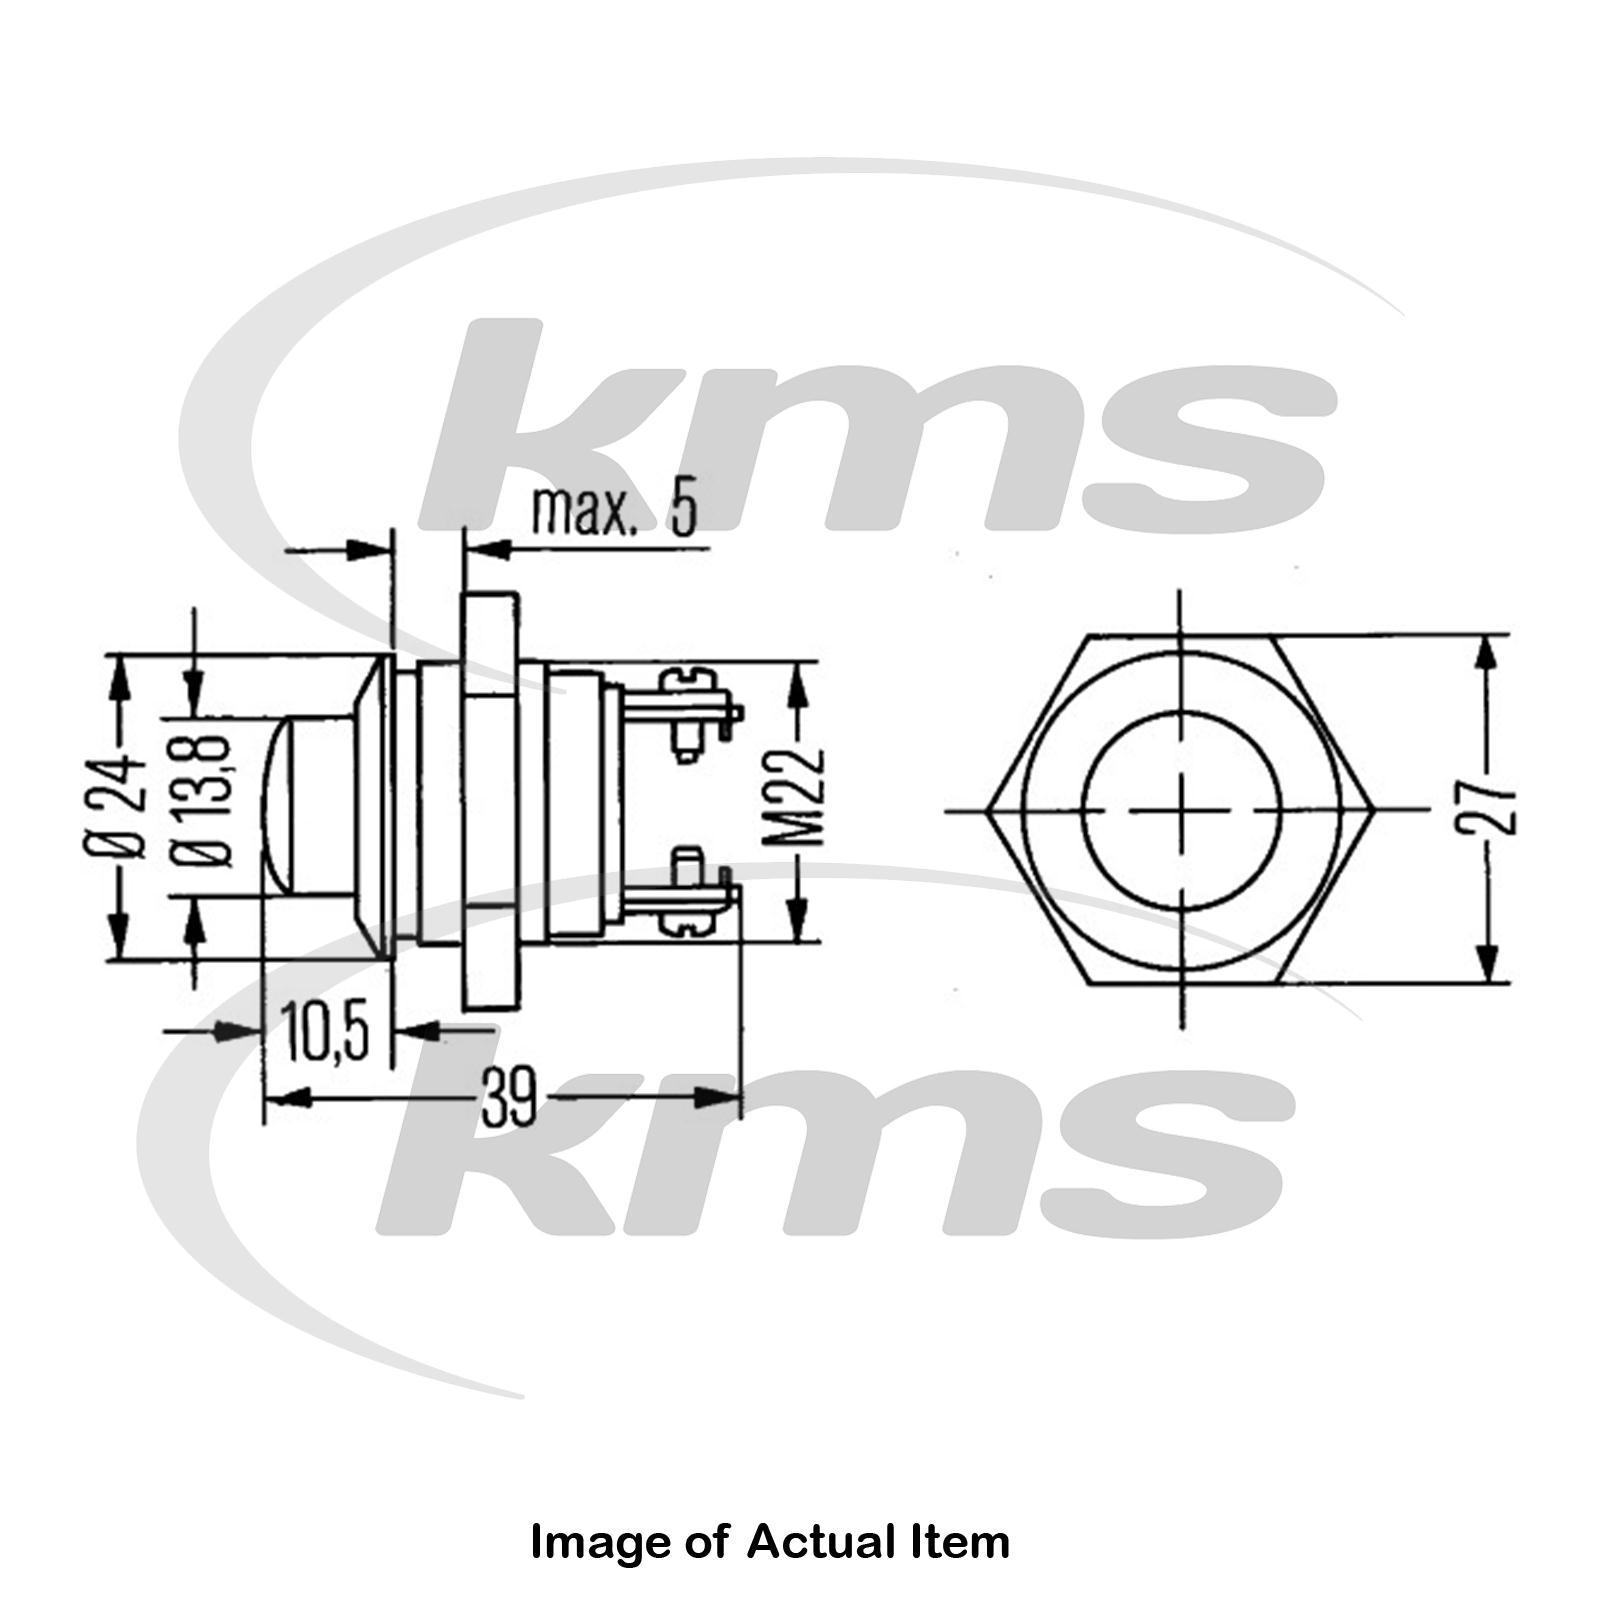 New Genuine Hella Ignition Starter Switch 6jf 001 571 Top German Liebherr Key Wiring Diagram Sentinel Quality